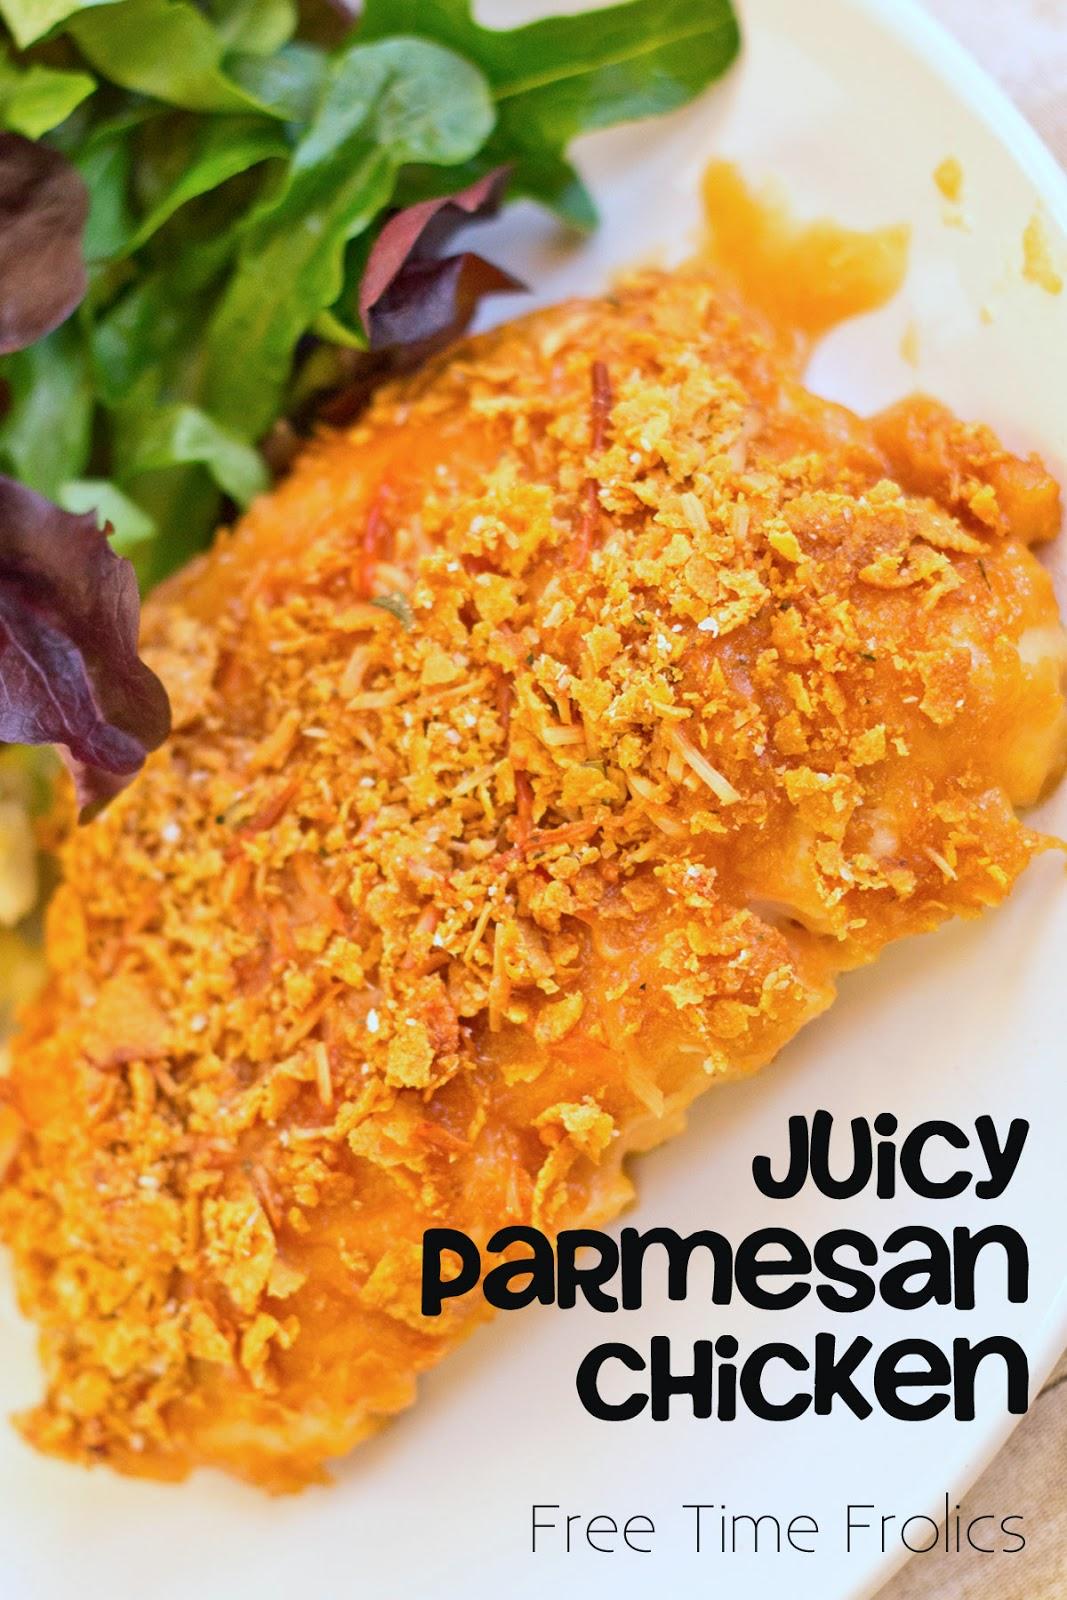 juicy parmesan chicken www.freetimefrolics.com #recipe #chicken